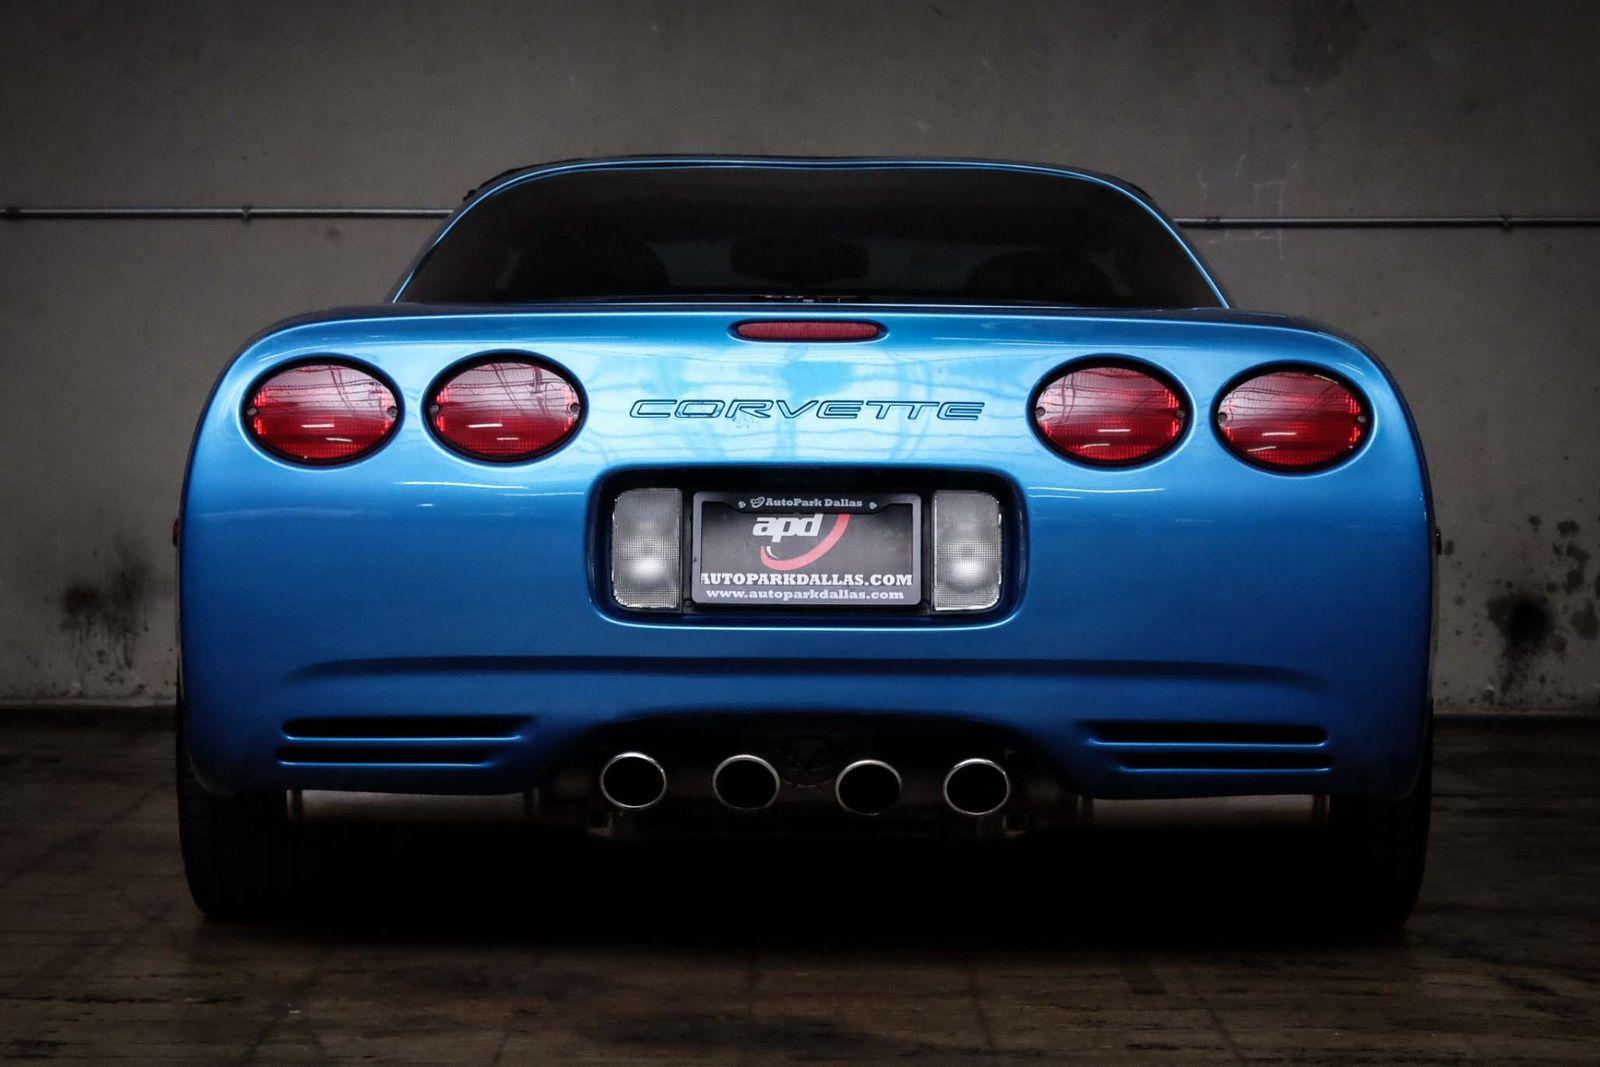 2000 Blue Chevrolet Corvette   | C5 Corvette Photo 7